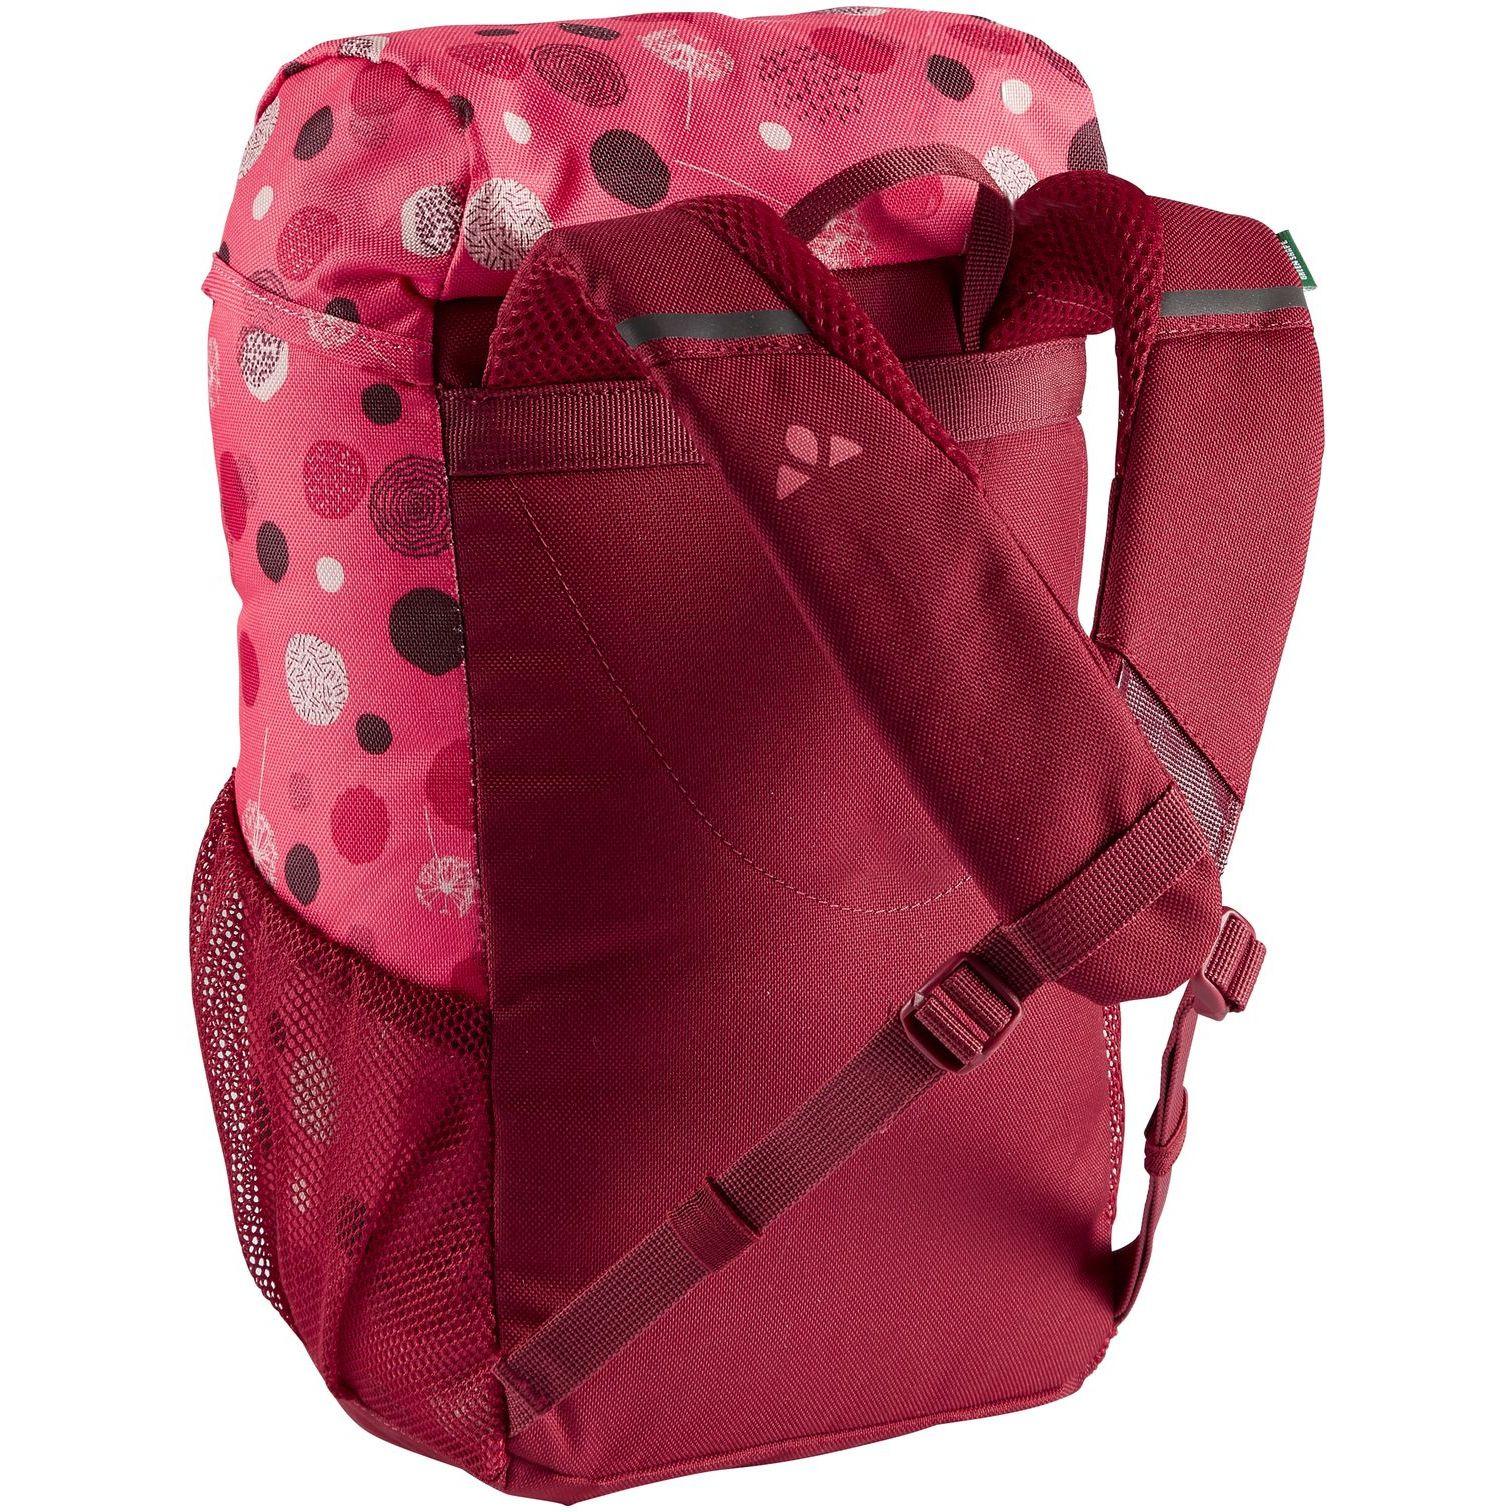 Image of Vaude Ayla 6 Kids Backpack - mars red